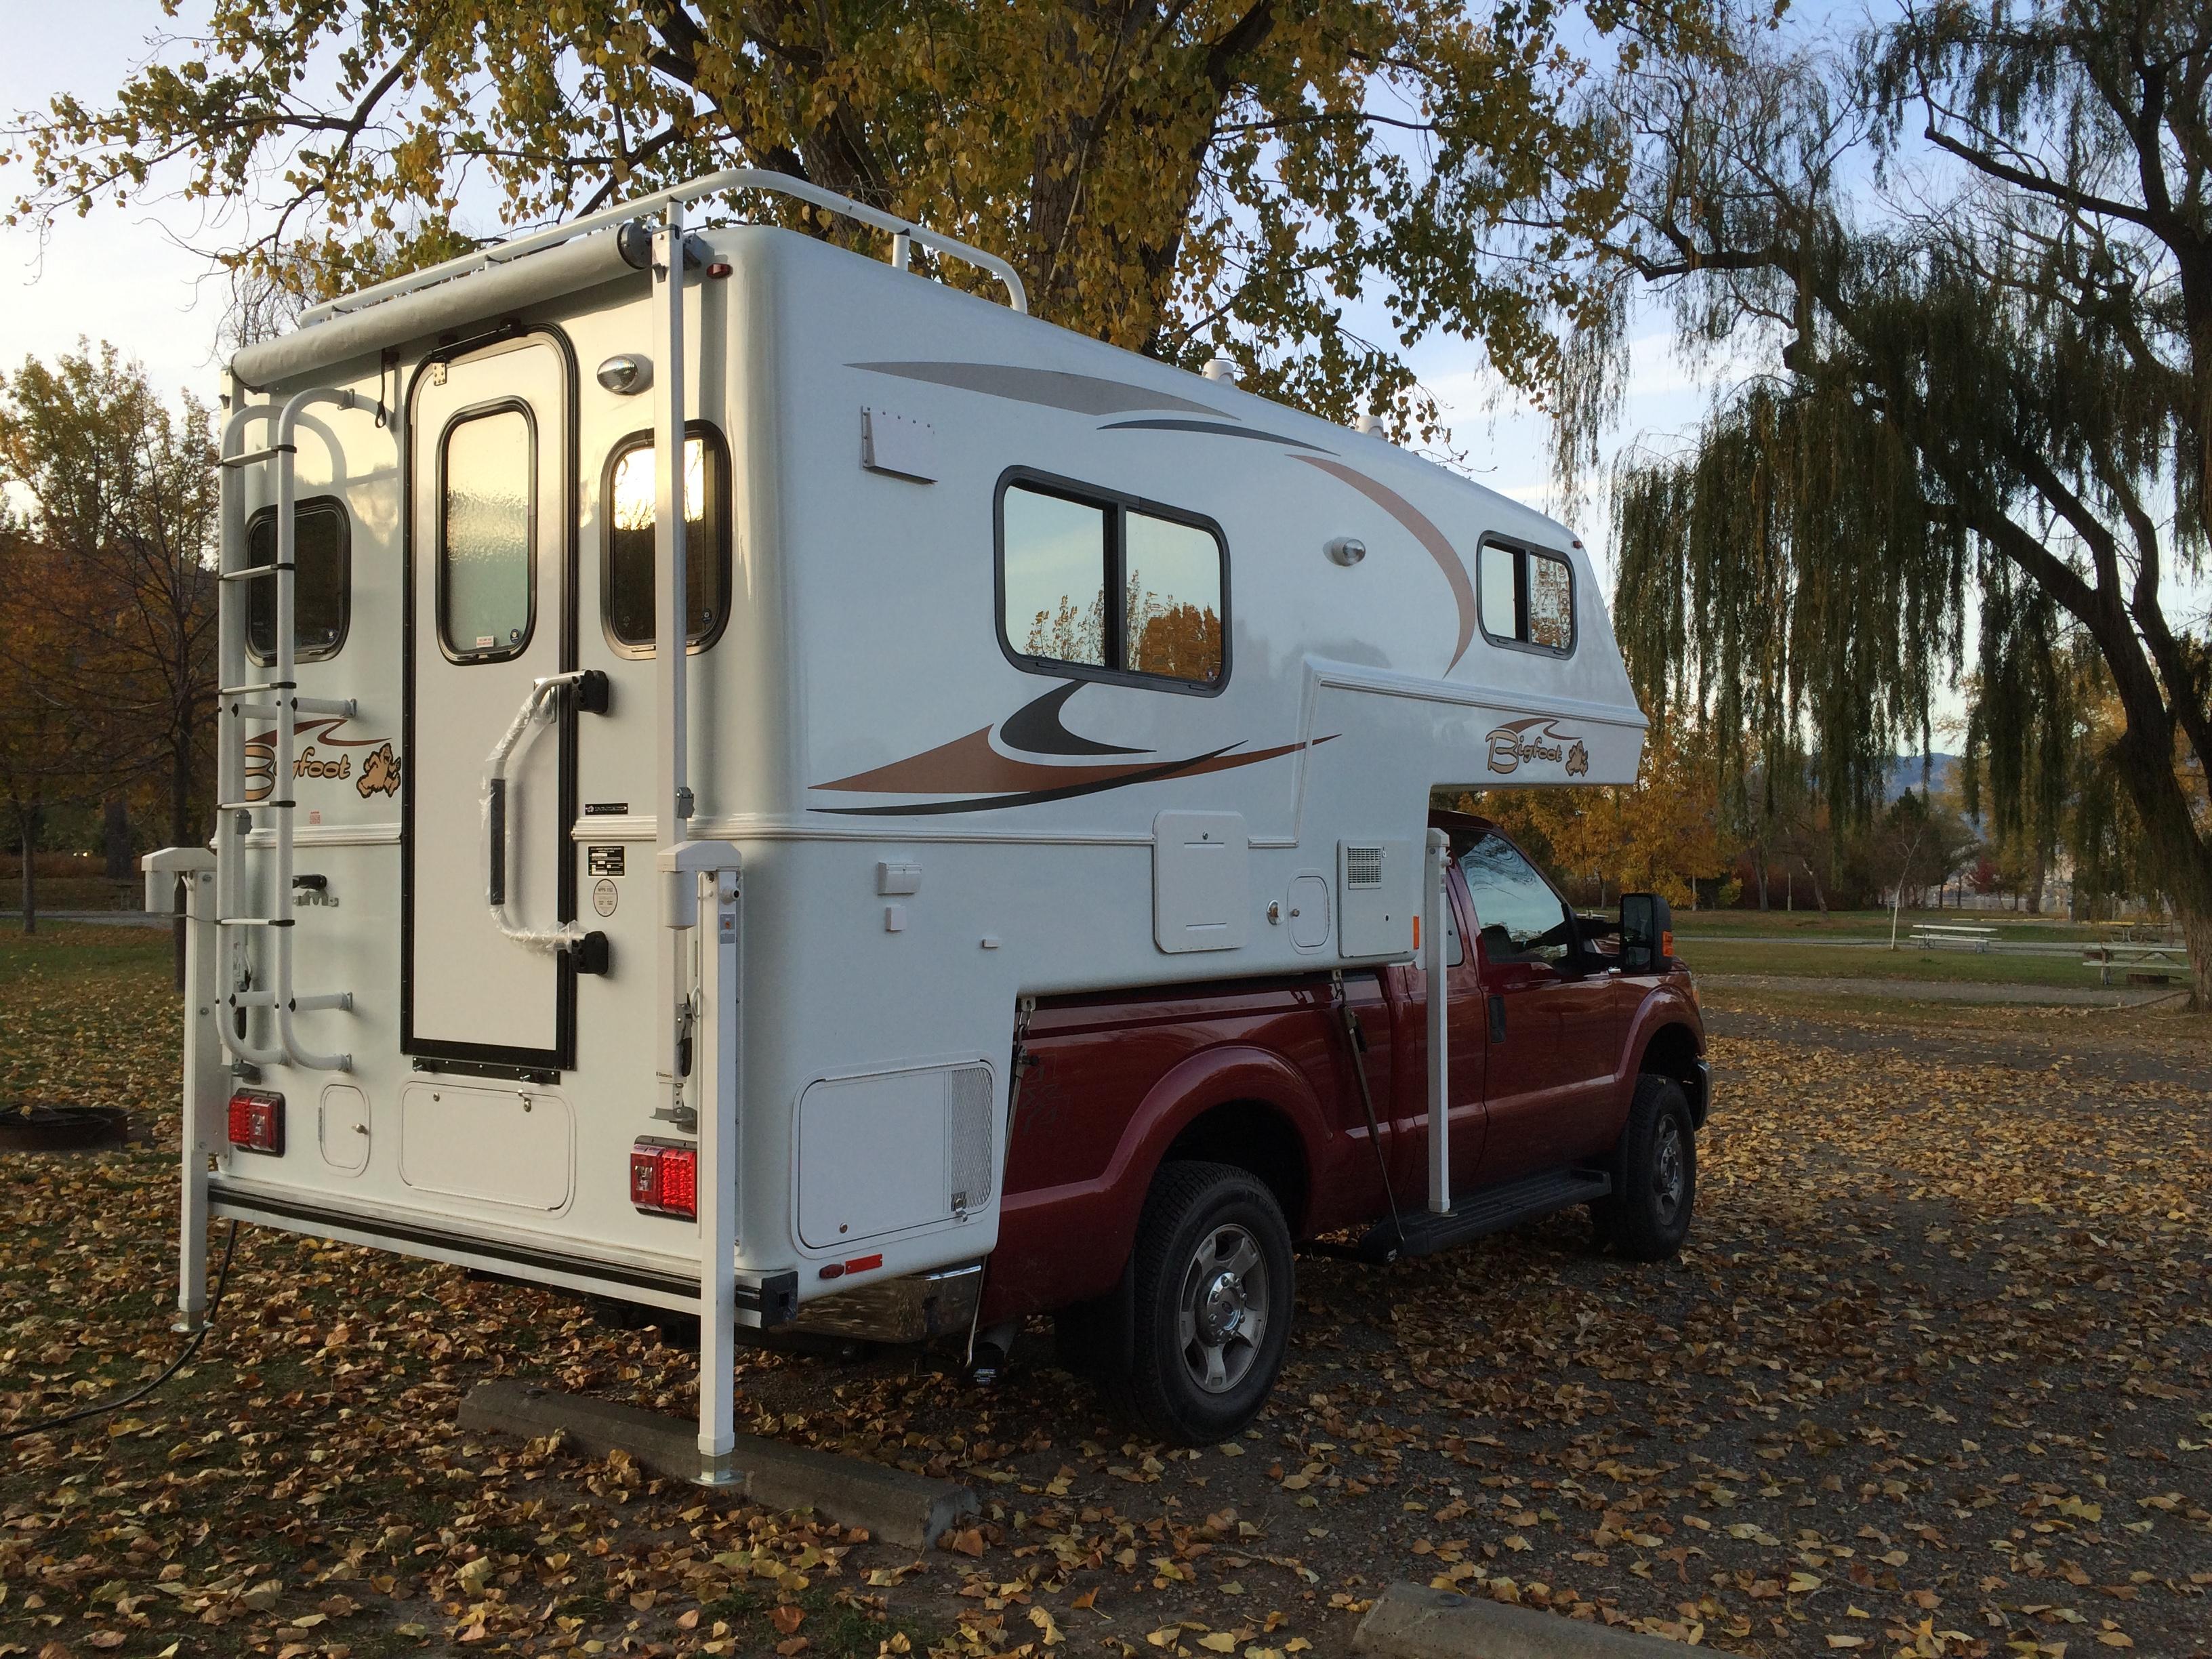 Review Of The 2017 Bigfoot 25c9 4sb Truck Camper Truck